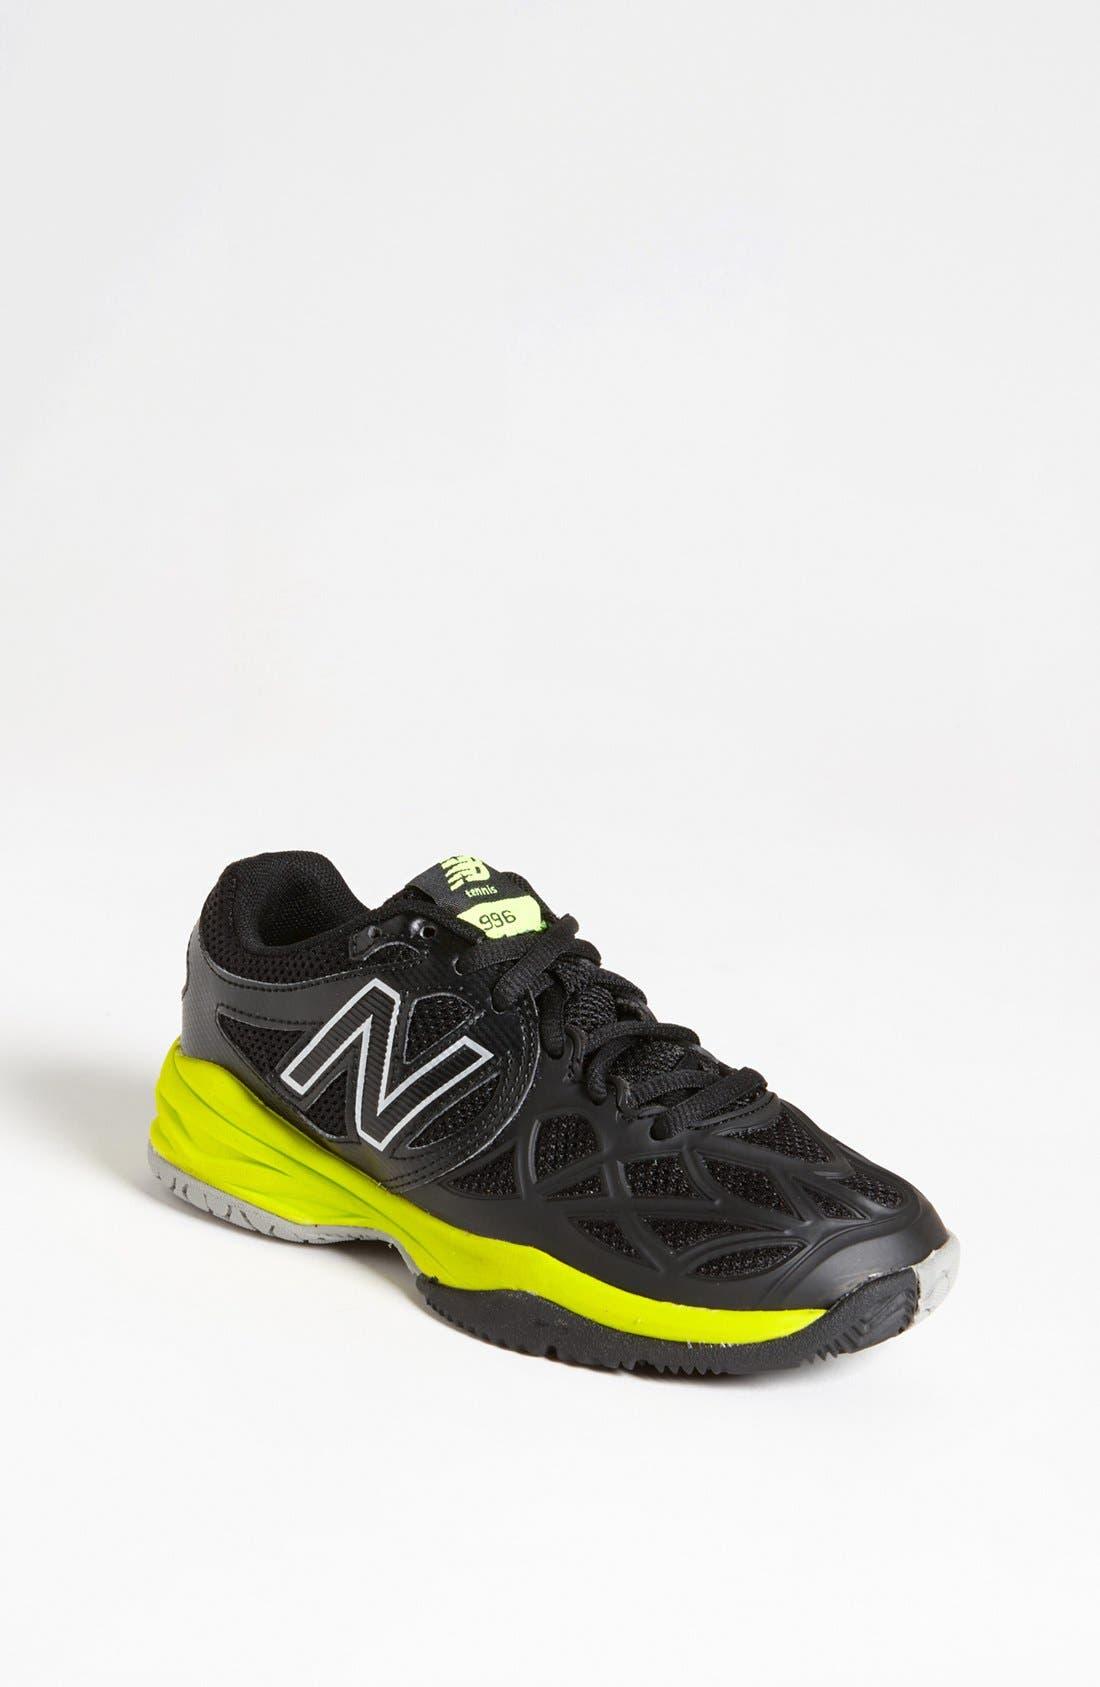 Alternate Image 1 Selected - New Balance Tennis Shoe (Toddler, Little Kid & Big Kid)